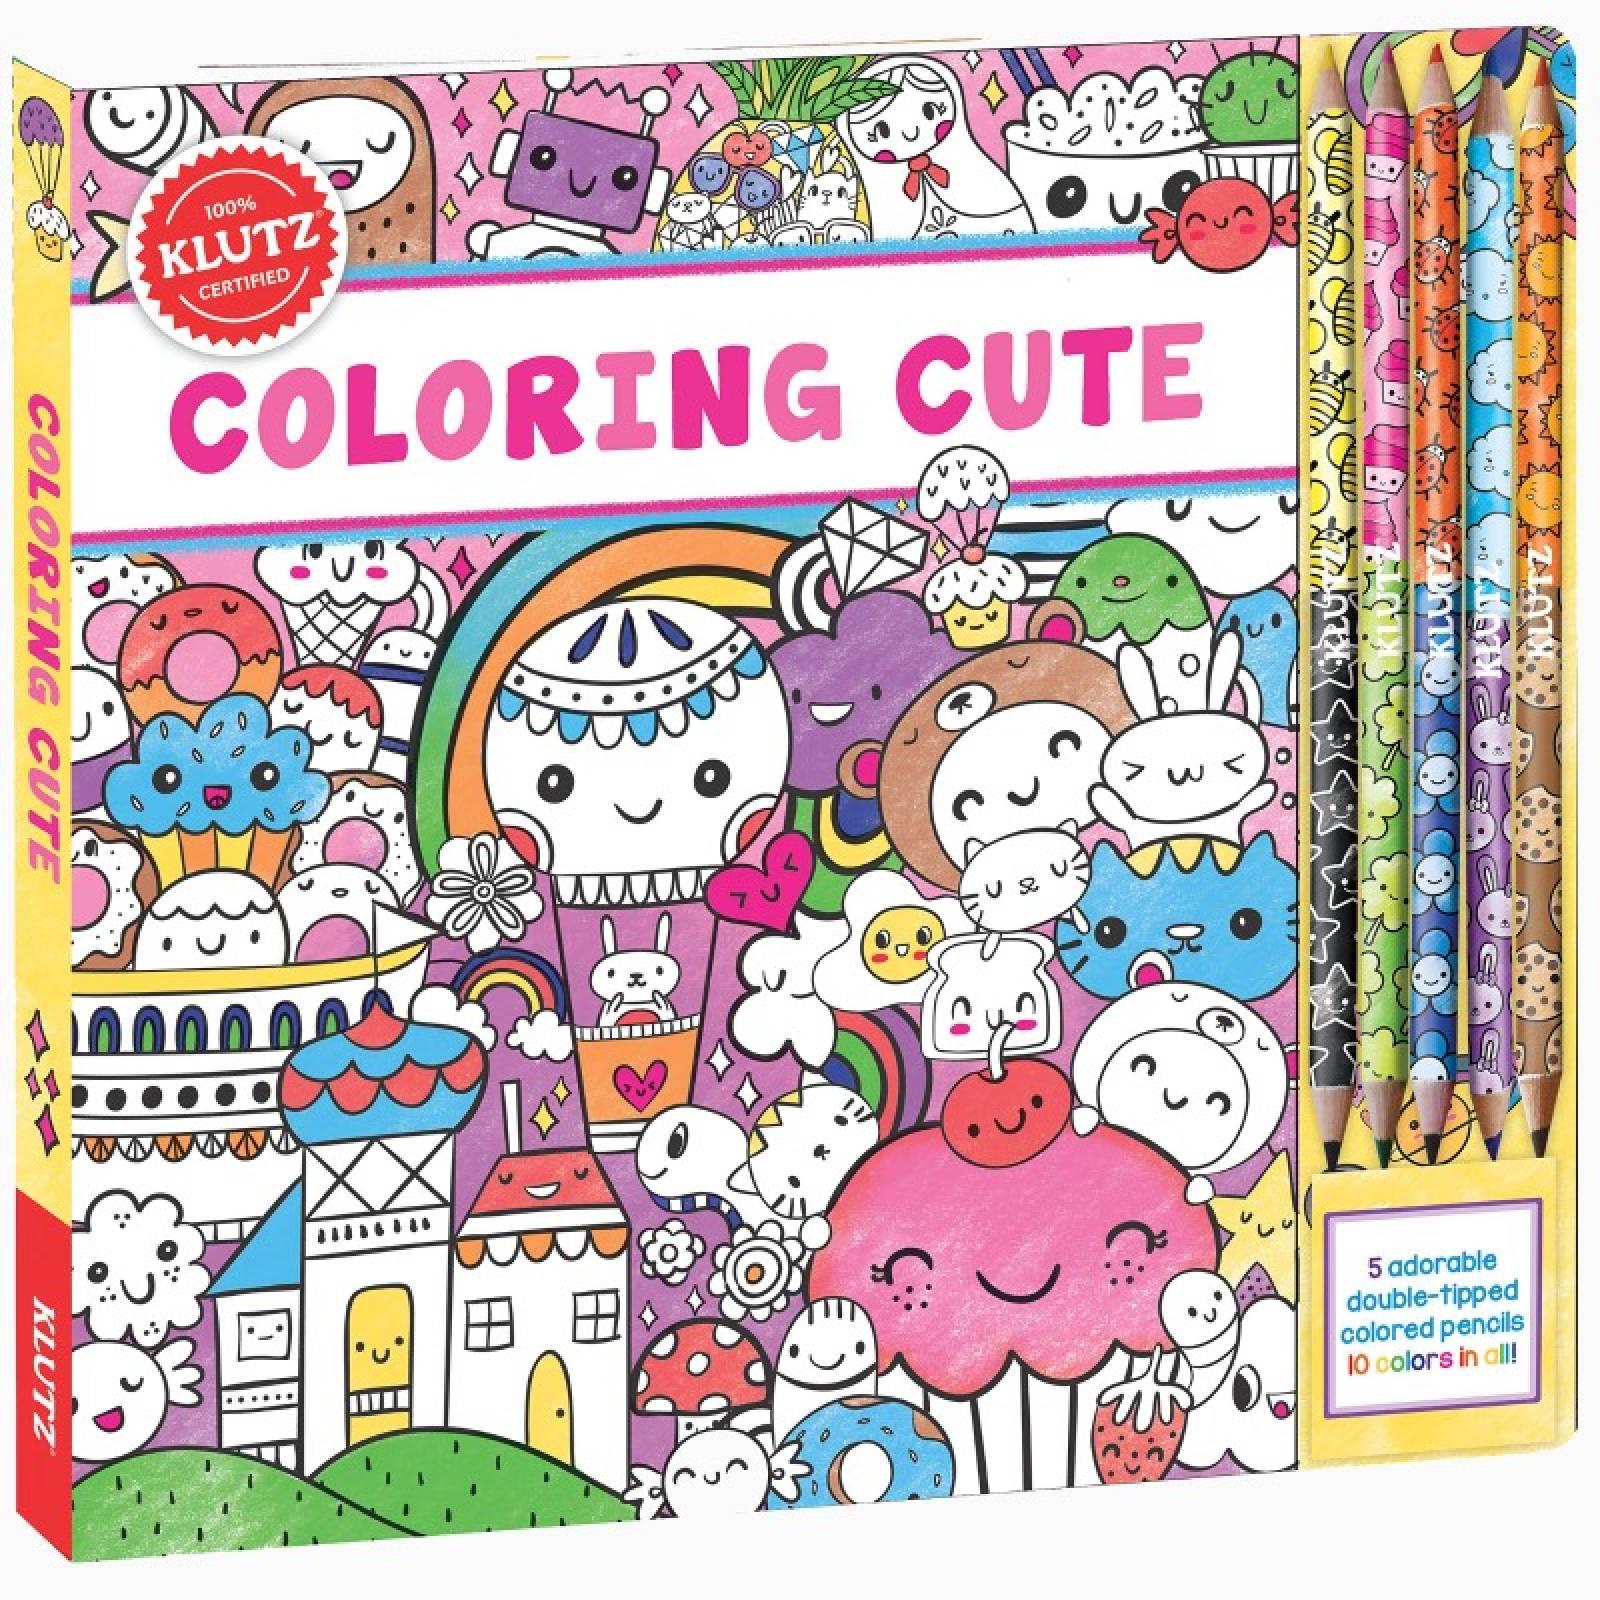 Colouring Cute - Colouring Set